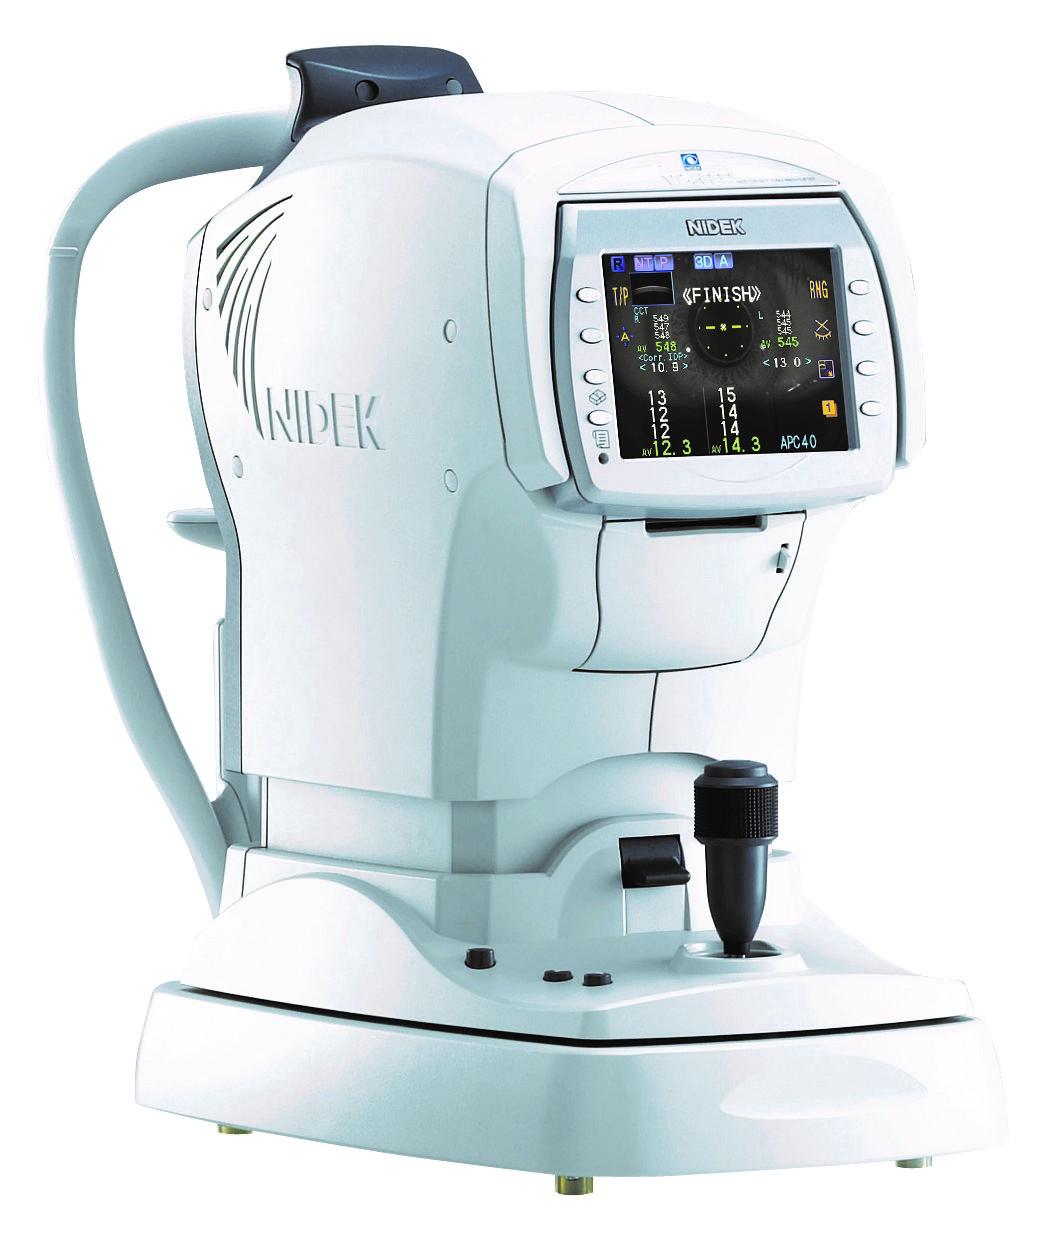 NT530P avec écran